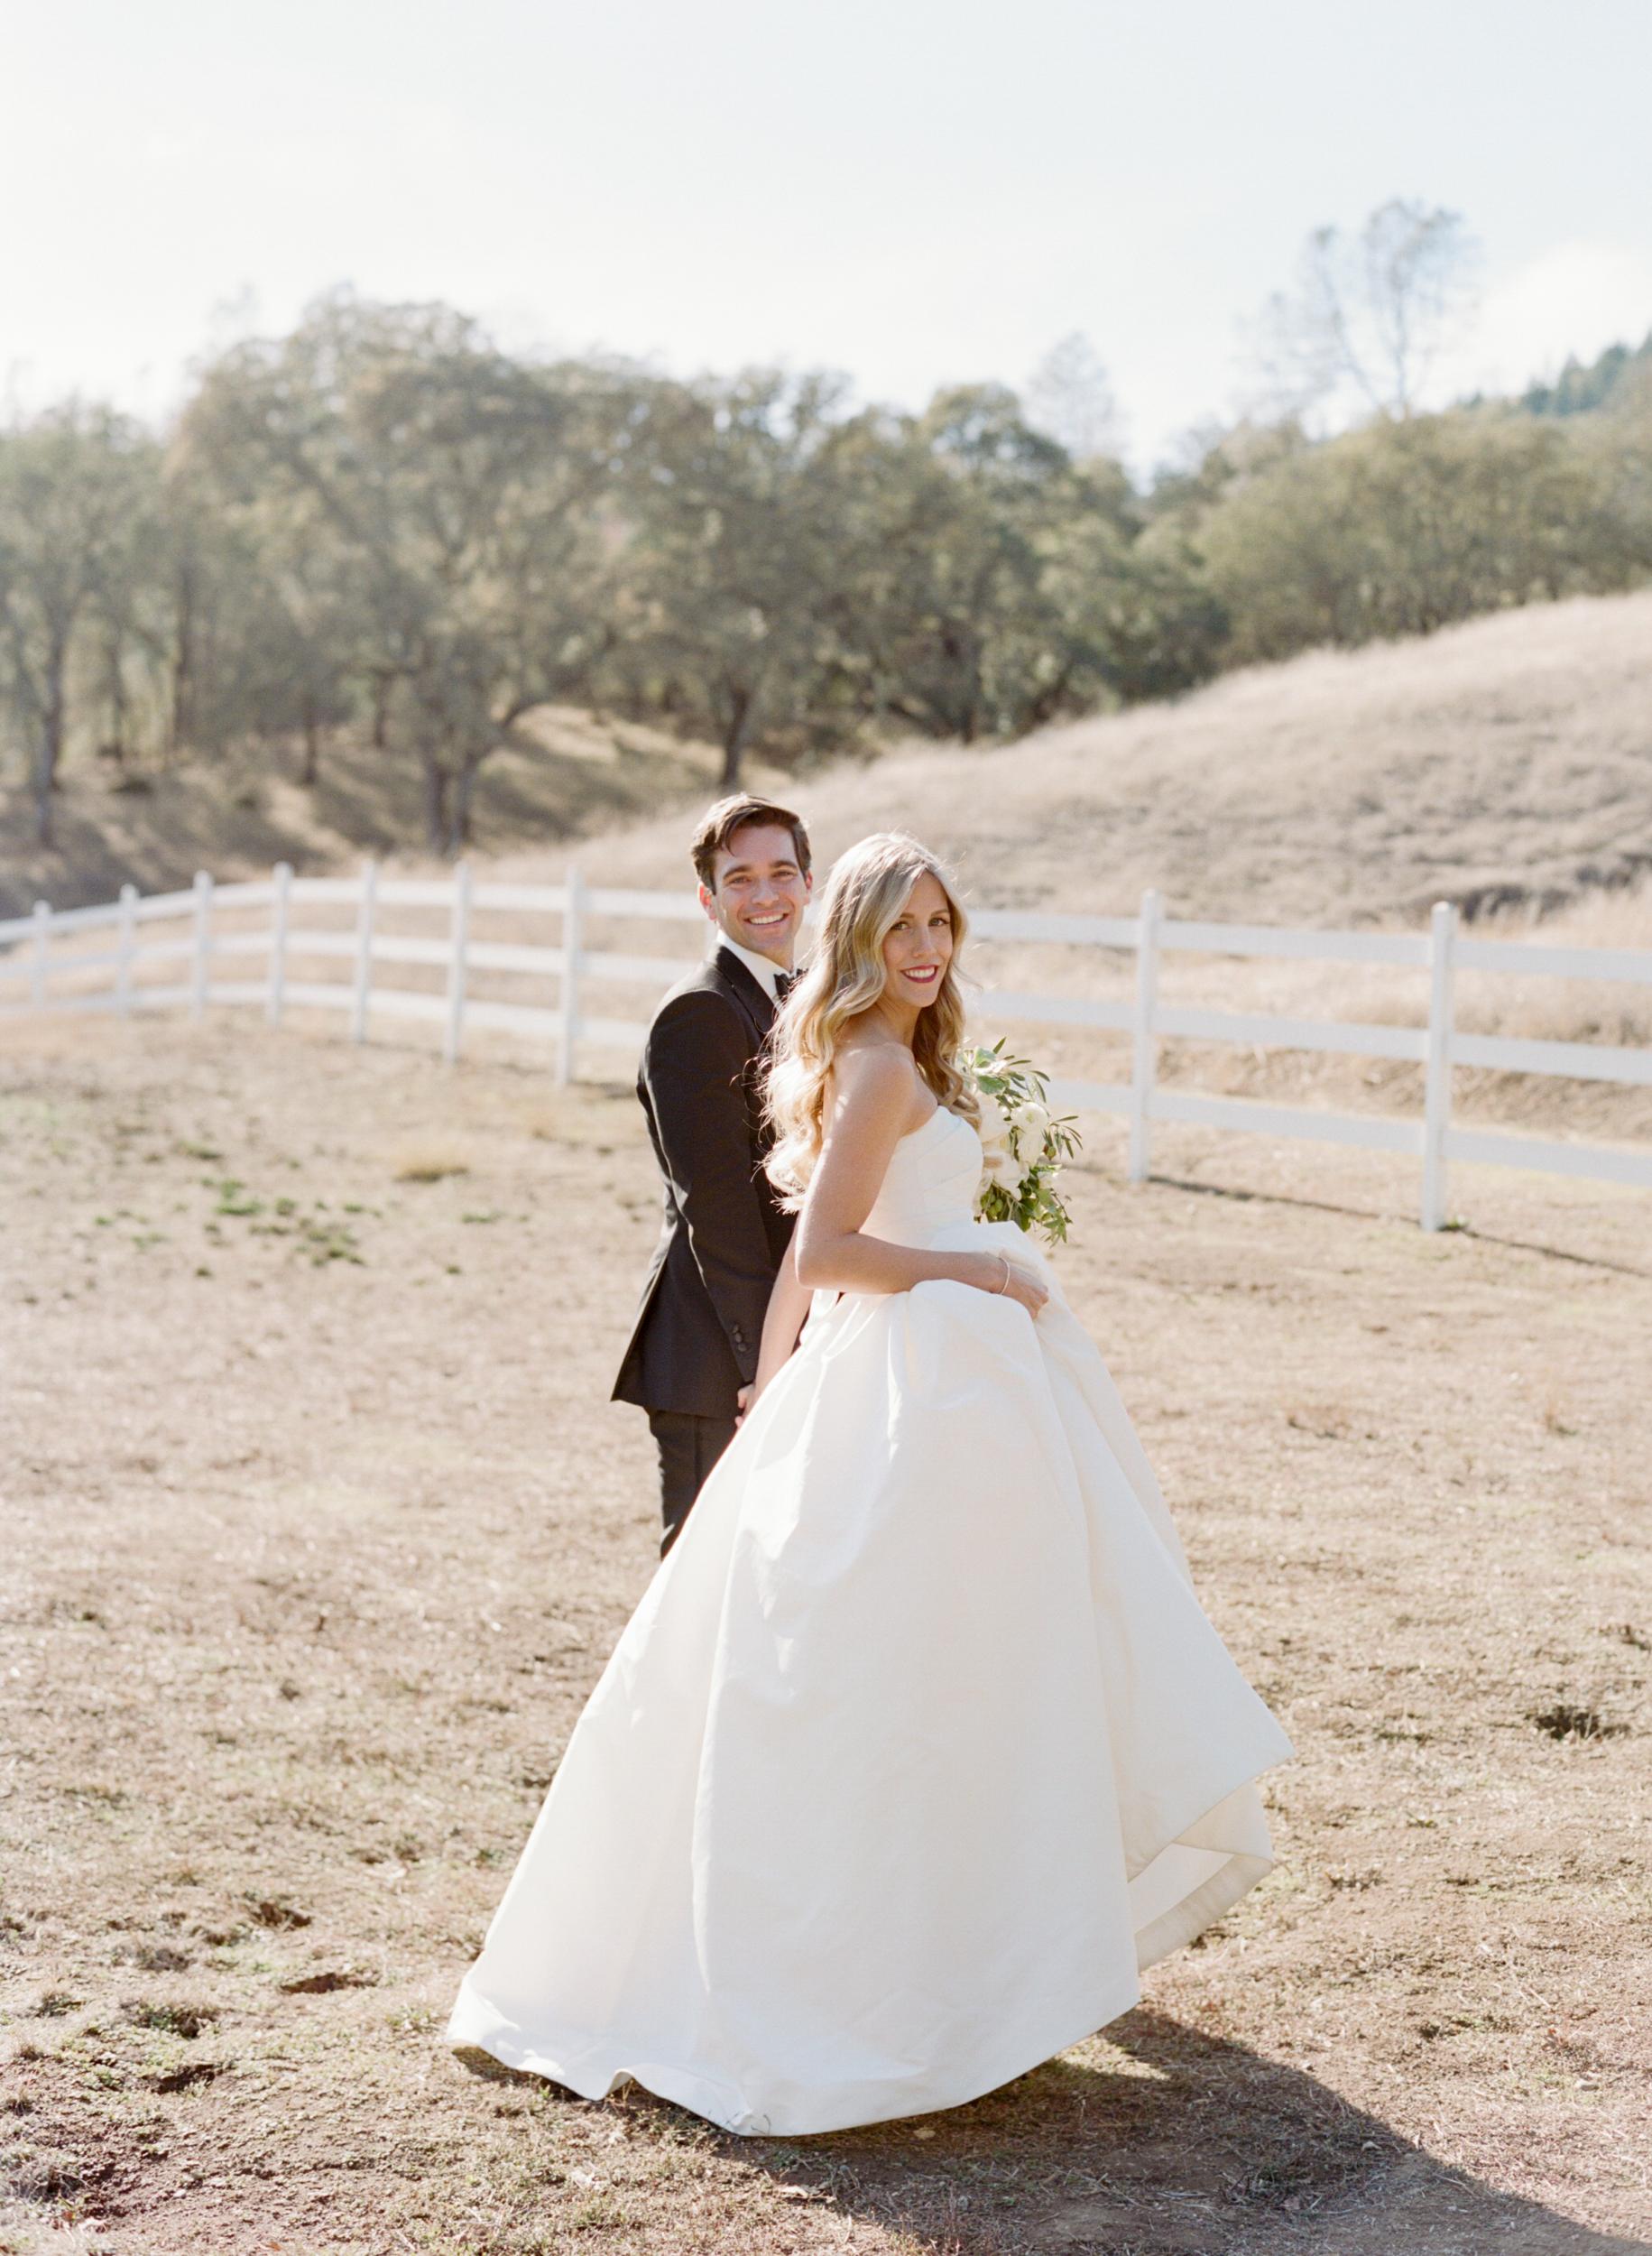 SylvieGil-Durham-Ranch-Organic-Ethereal-Rustic-Romantic-Industrial-Chic-Wedding